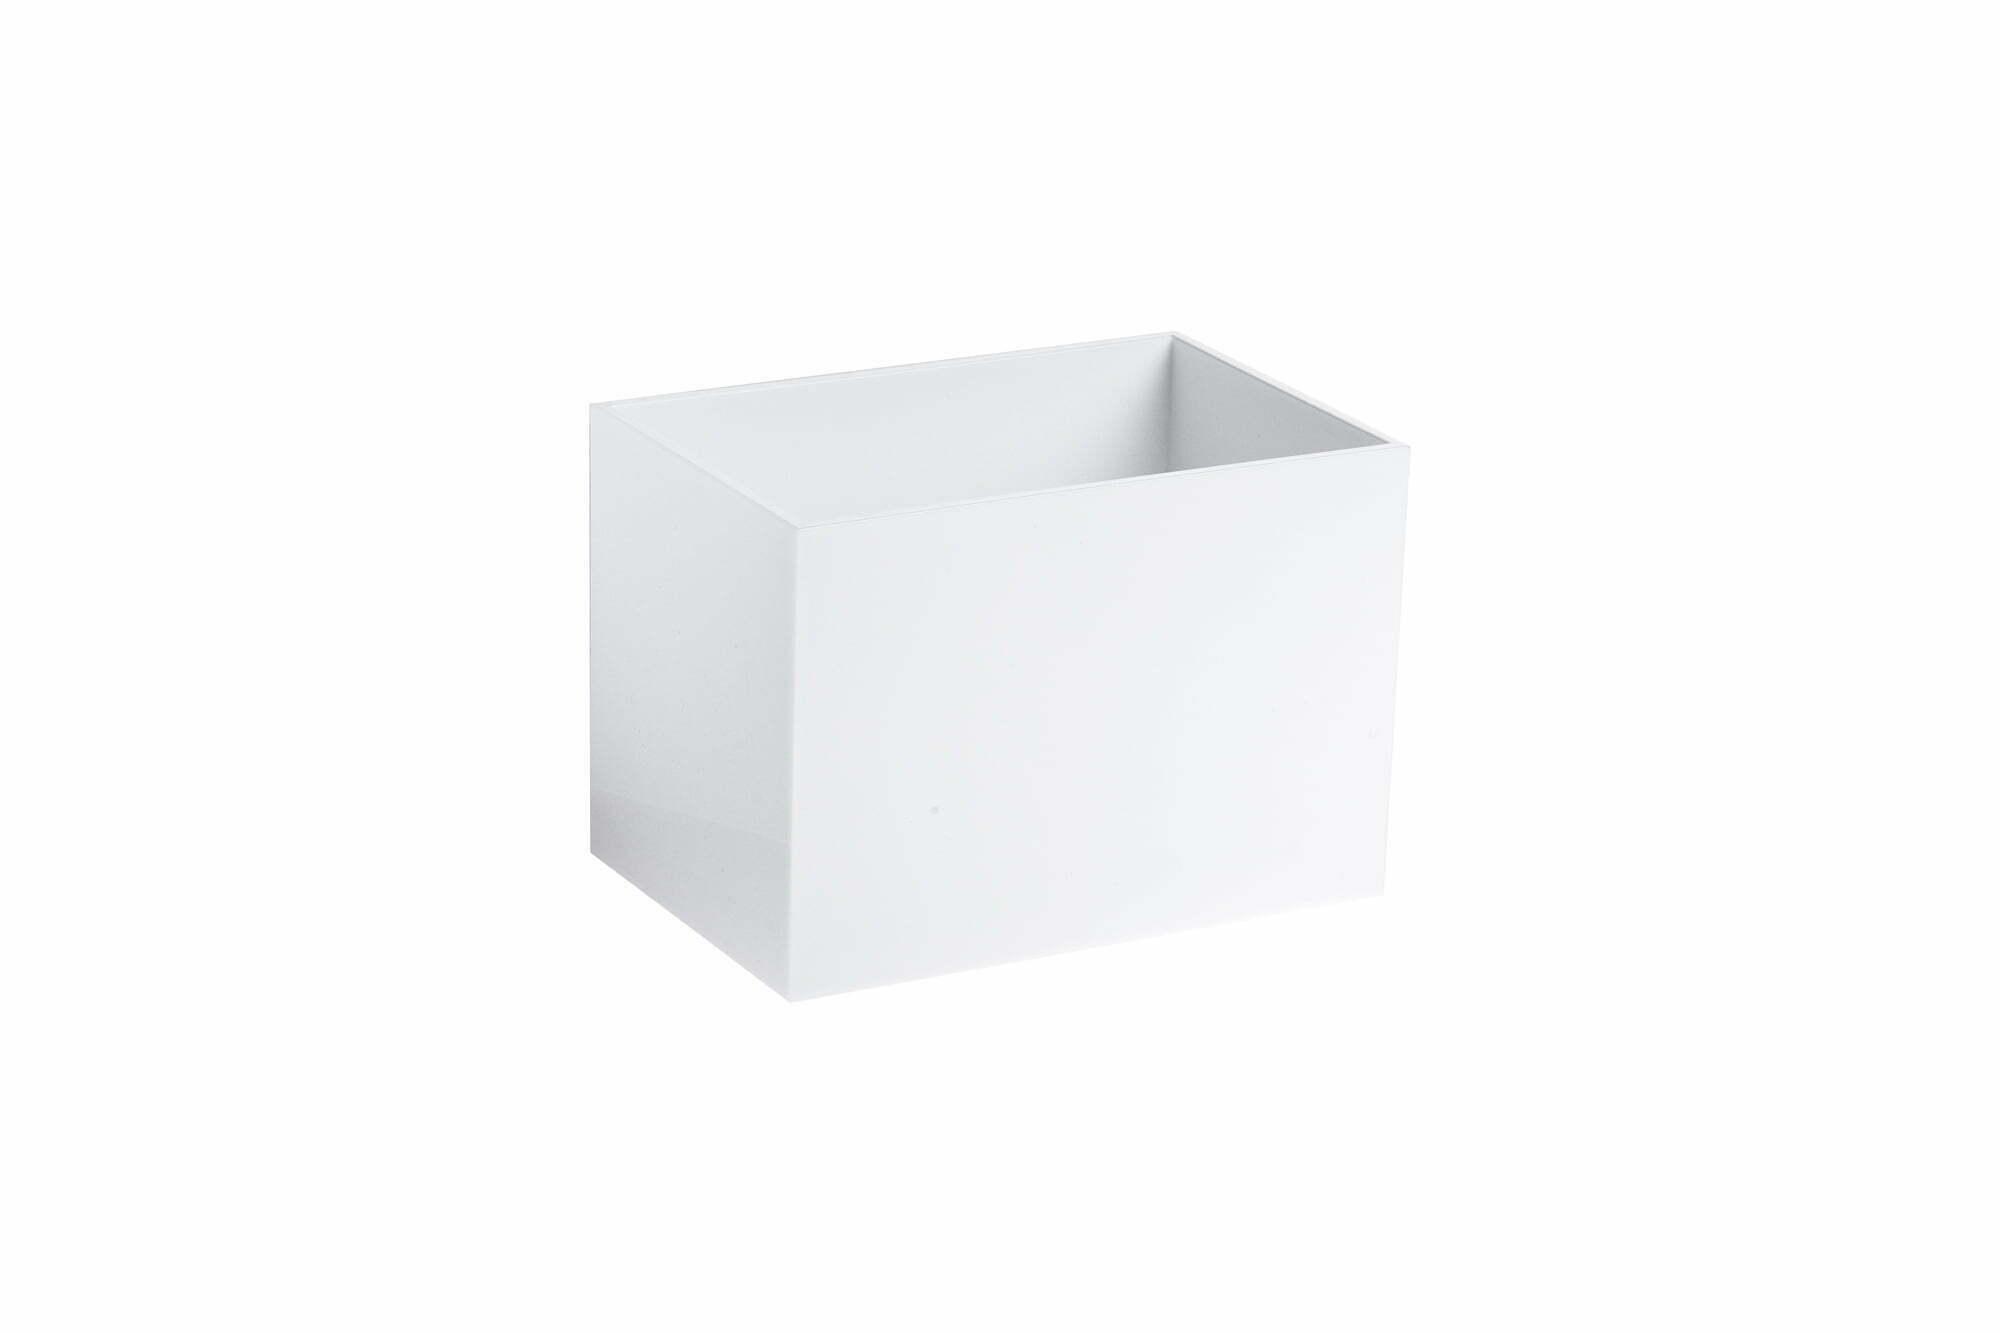 Box XL_Boksi XL P-2002